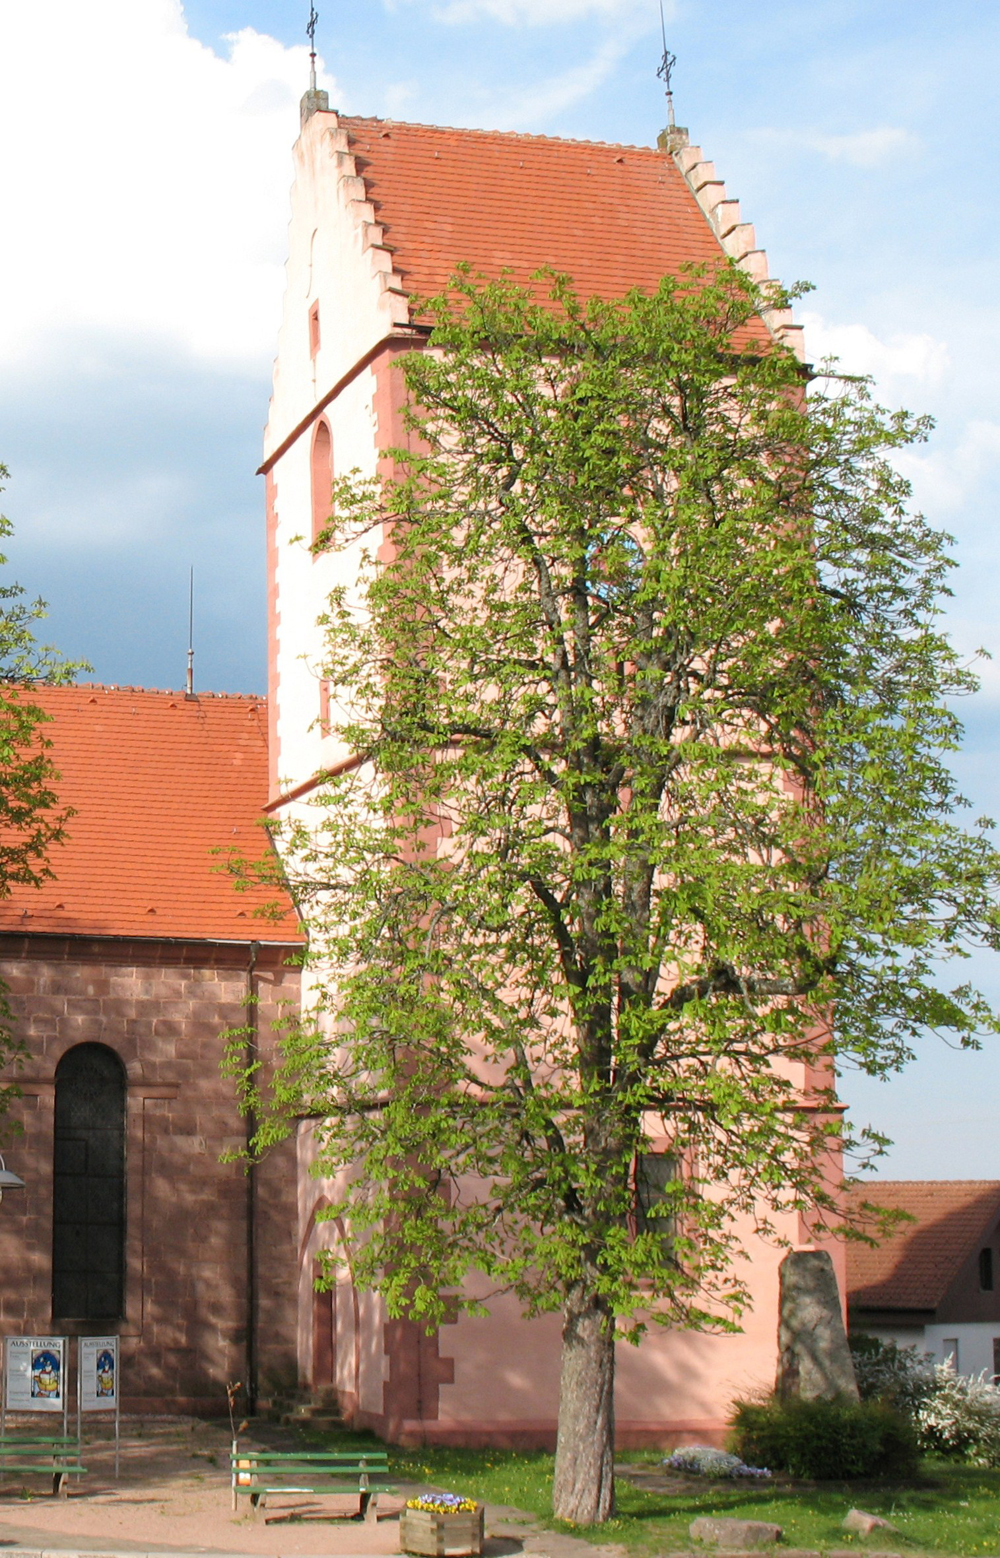 Sulgen, Alte St.-Laurentius-Kirche, Schramberg